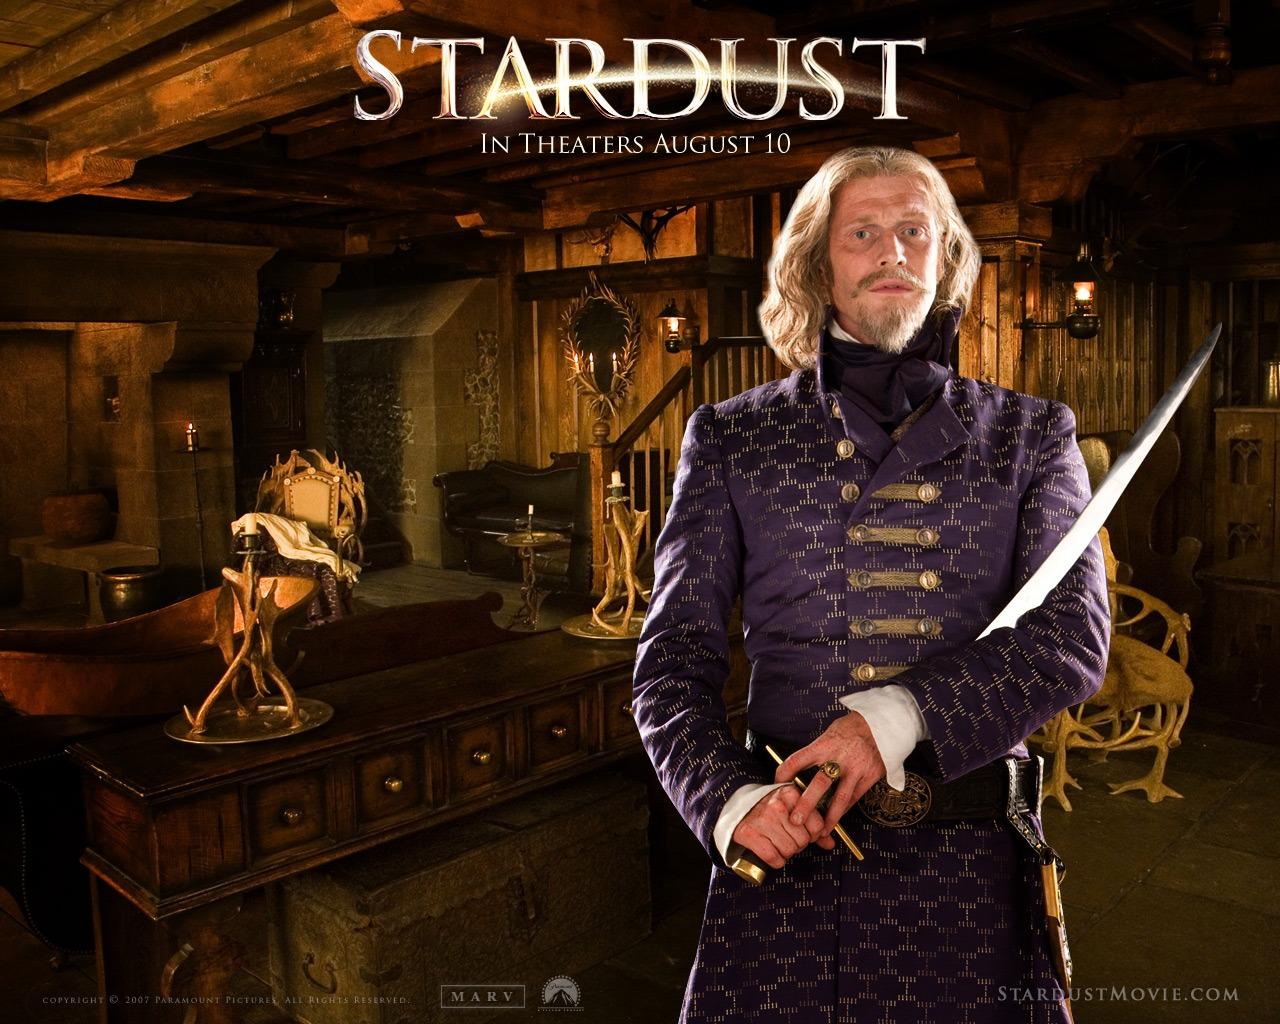 Beautiful Wallpaper Movie Stardust - stardust_primus_wallpaper_stardust_movies_920  Image_723138.jpg